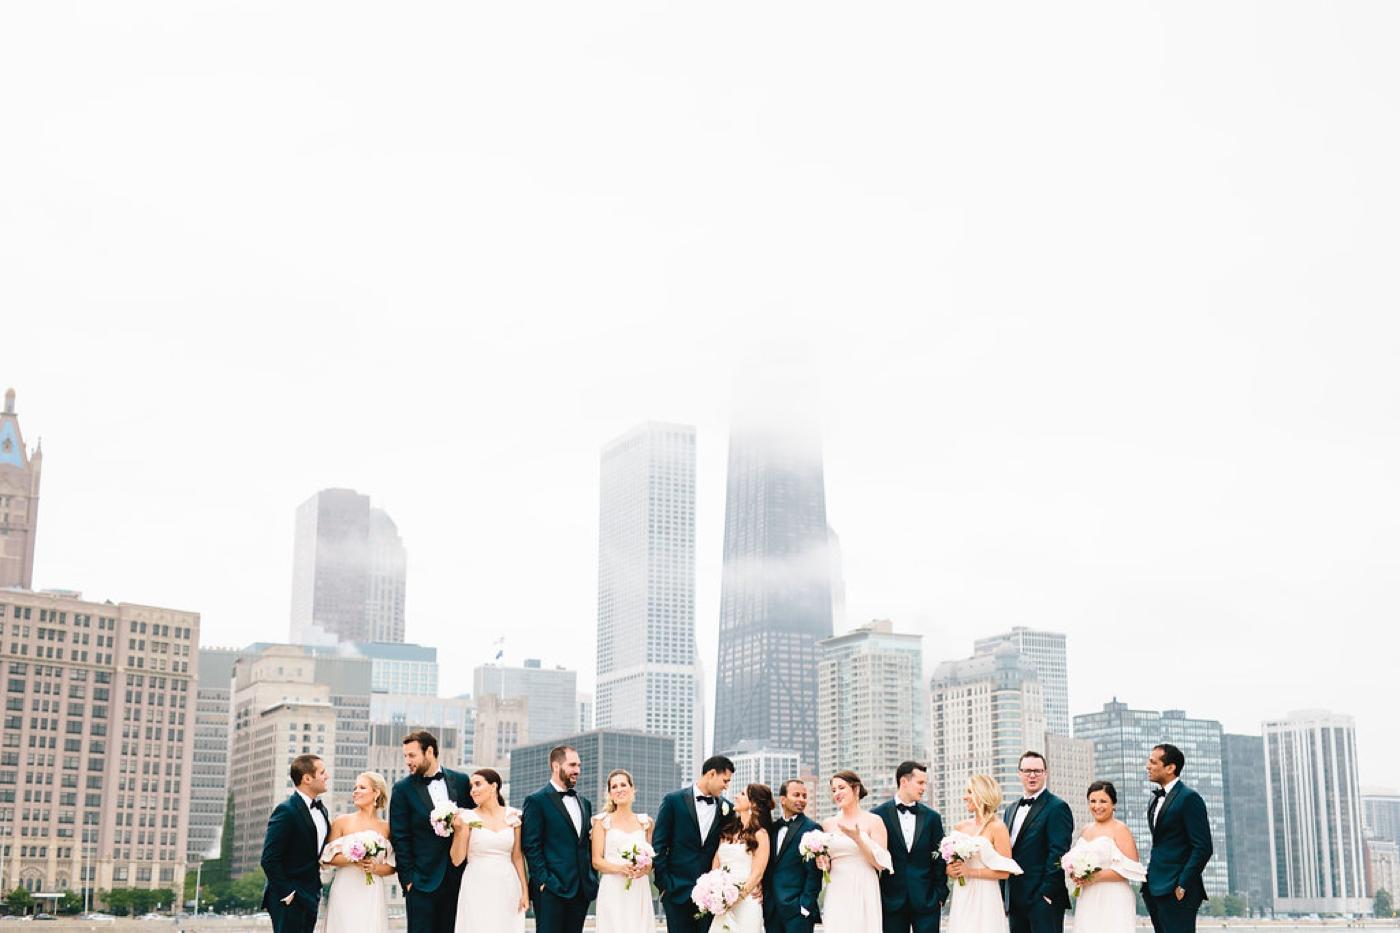 chicago-fine-art-wedding-photography-sakamuri28